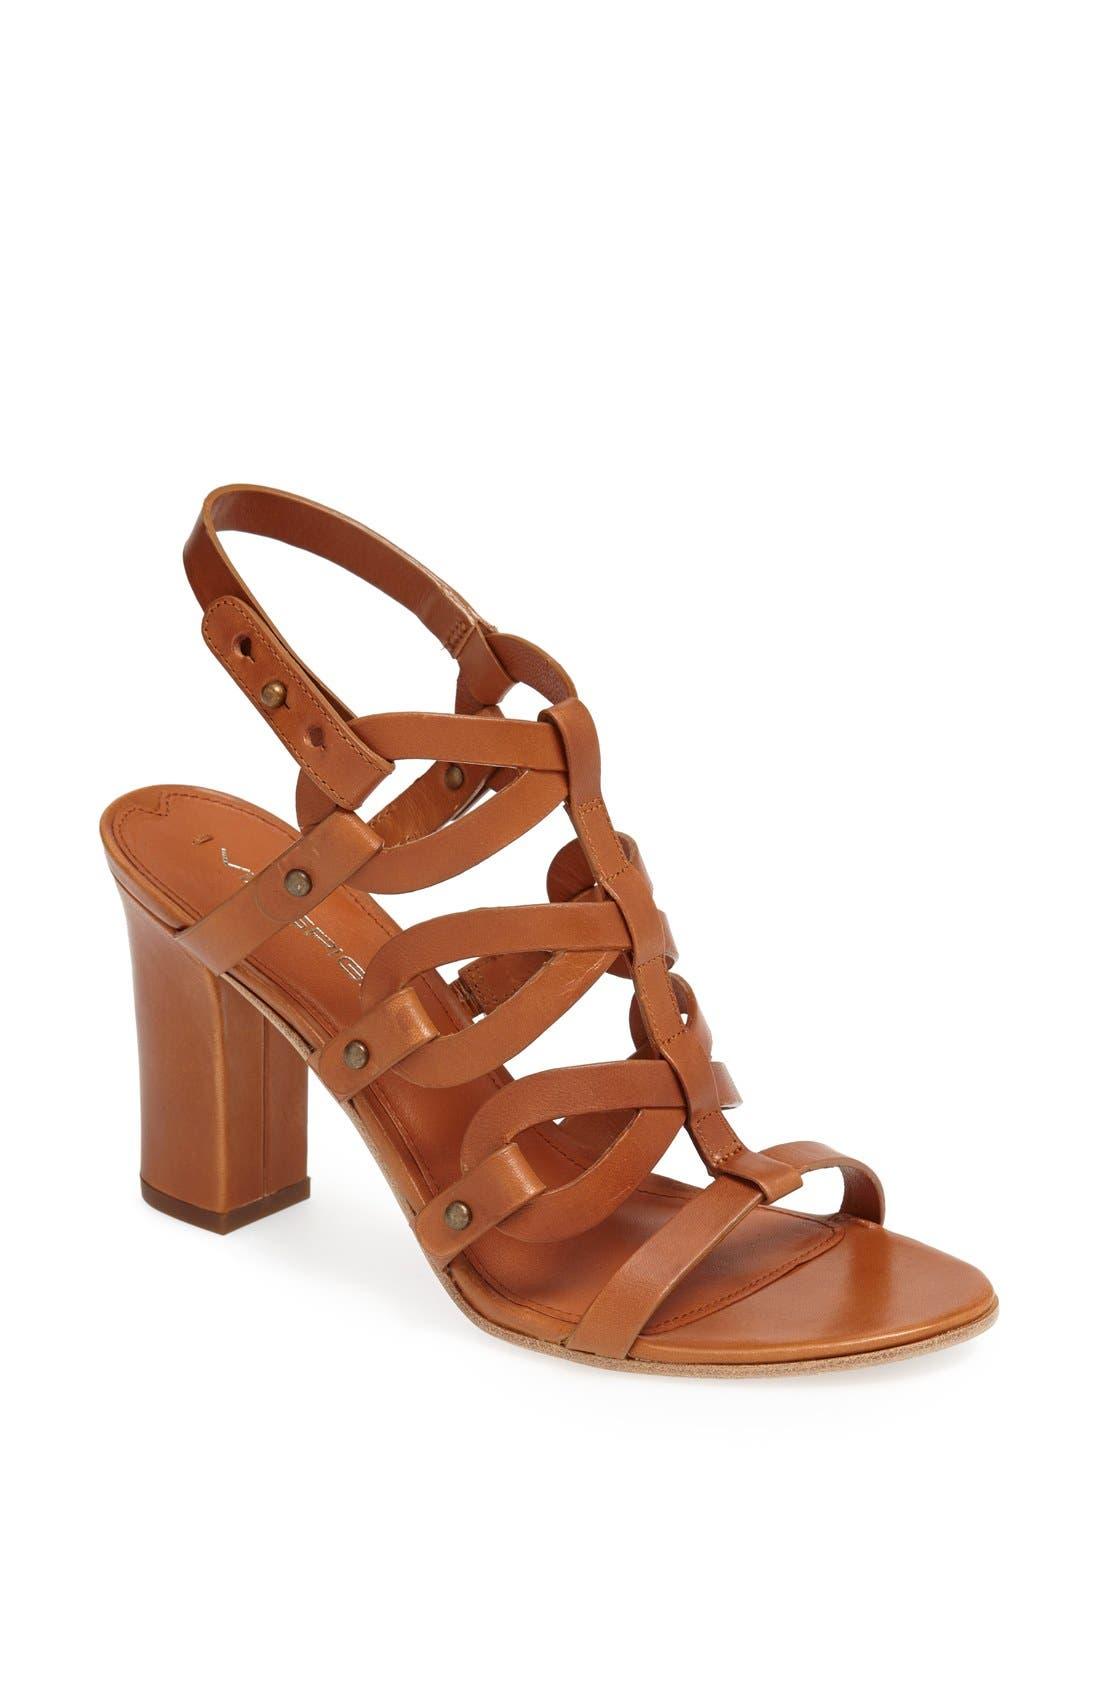 Alternate Image 1 Selected - Via Spiga 'Federica' Sandal